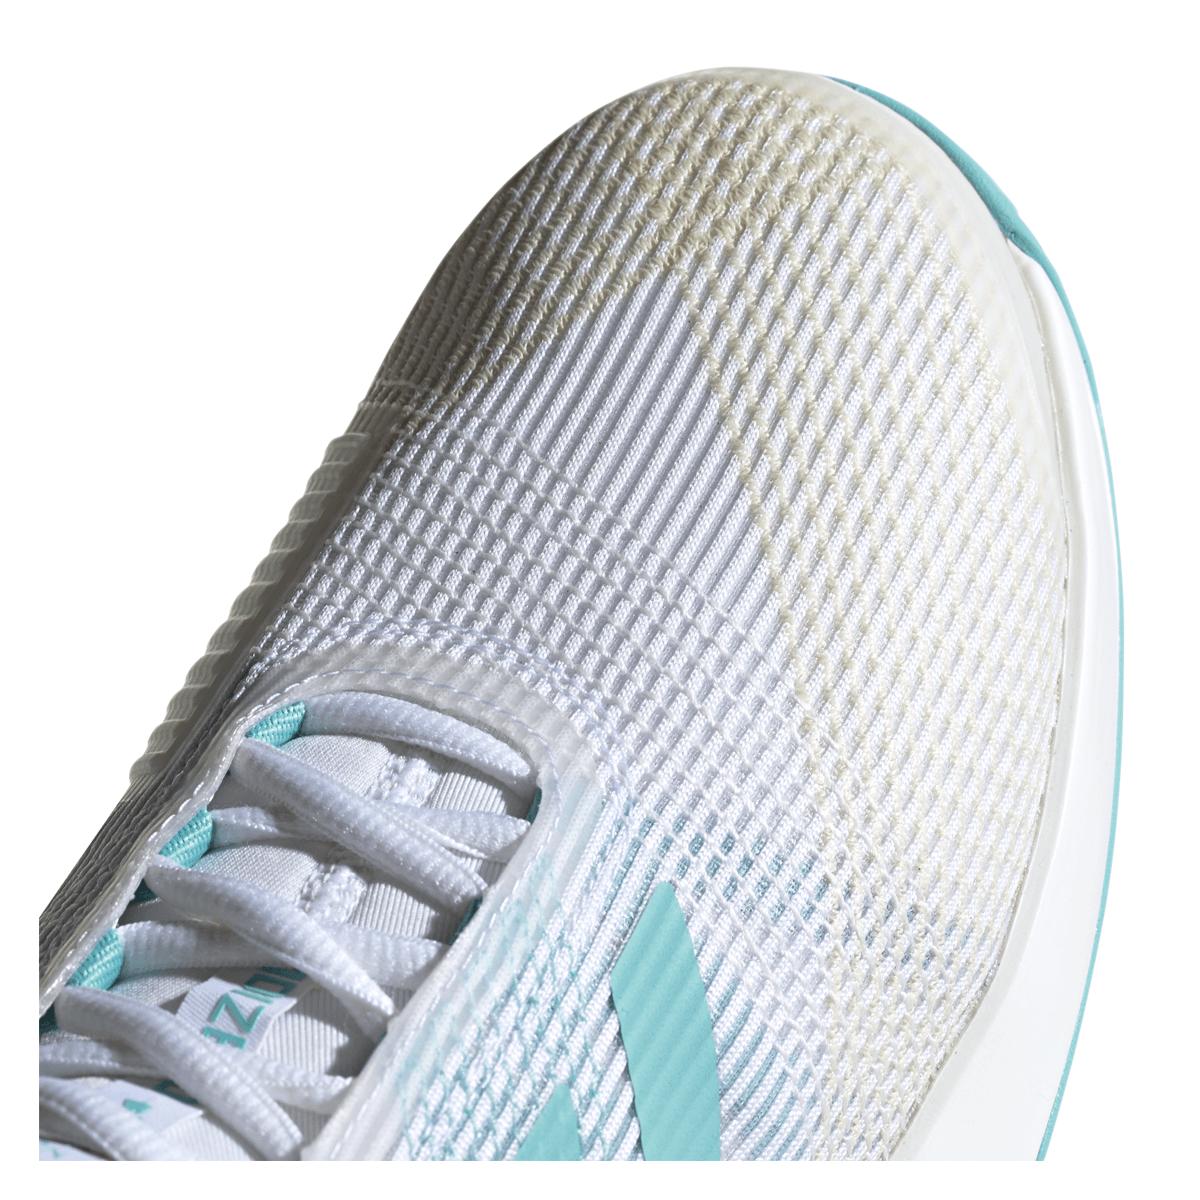 Iii Adizero Adidas Ubersonic Schuh Parley X Weißtürkis xdCoBre